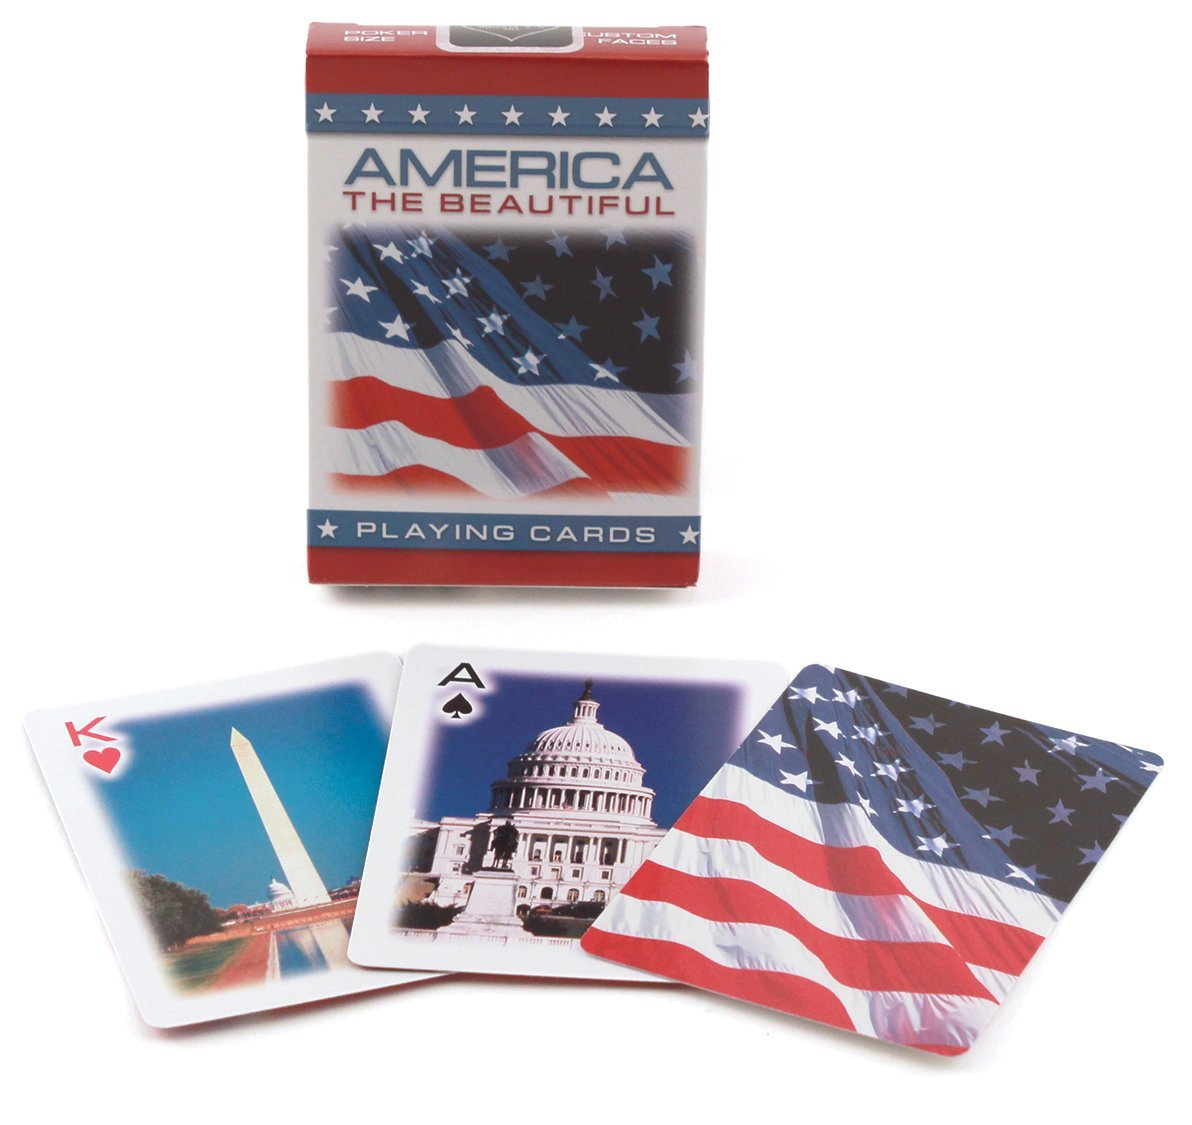 Bicicletta 91 –  185.435, 2 cm America The Beautiful carte da gioco Bicicletta 91-185.435 2cm America The Beautiful carte da gioco Bicycle 1023734